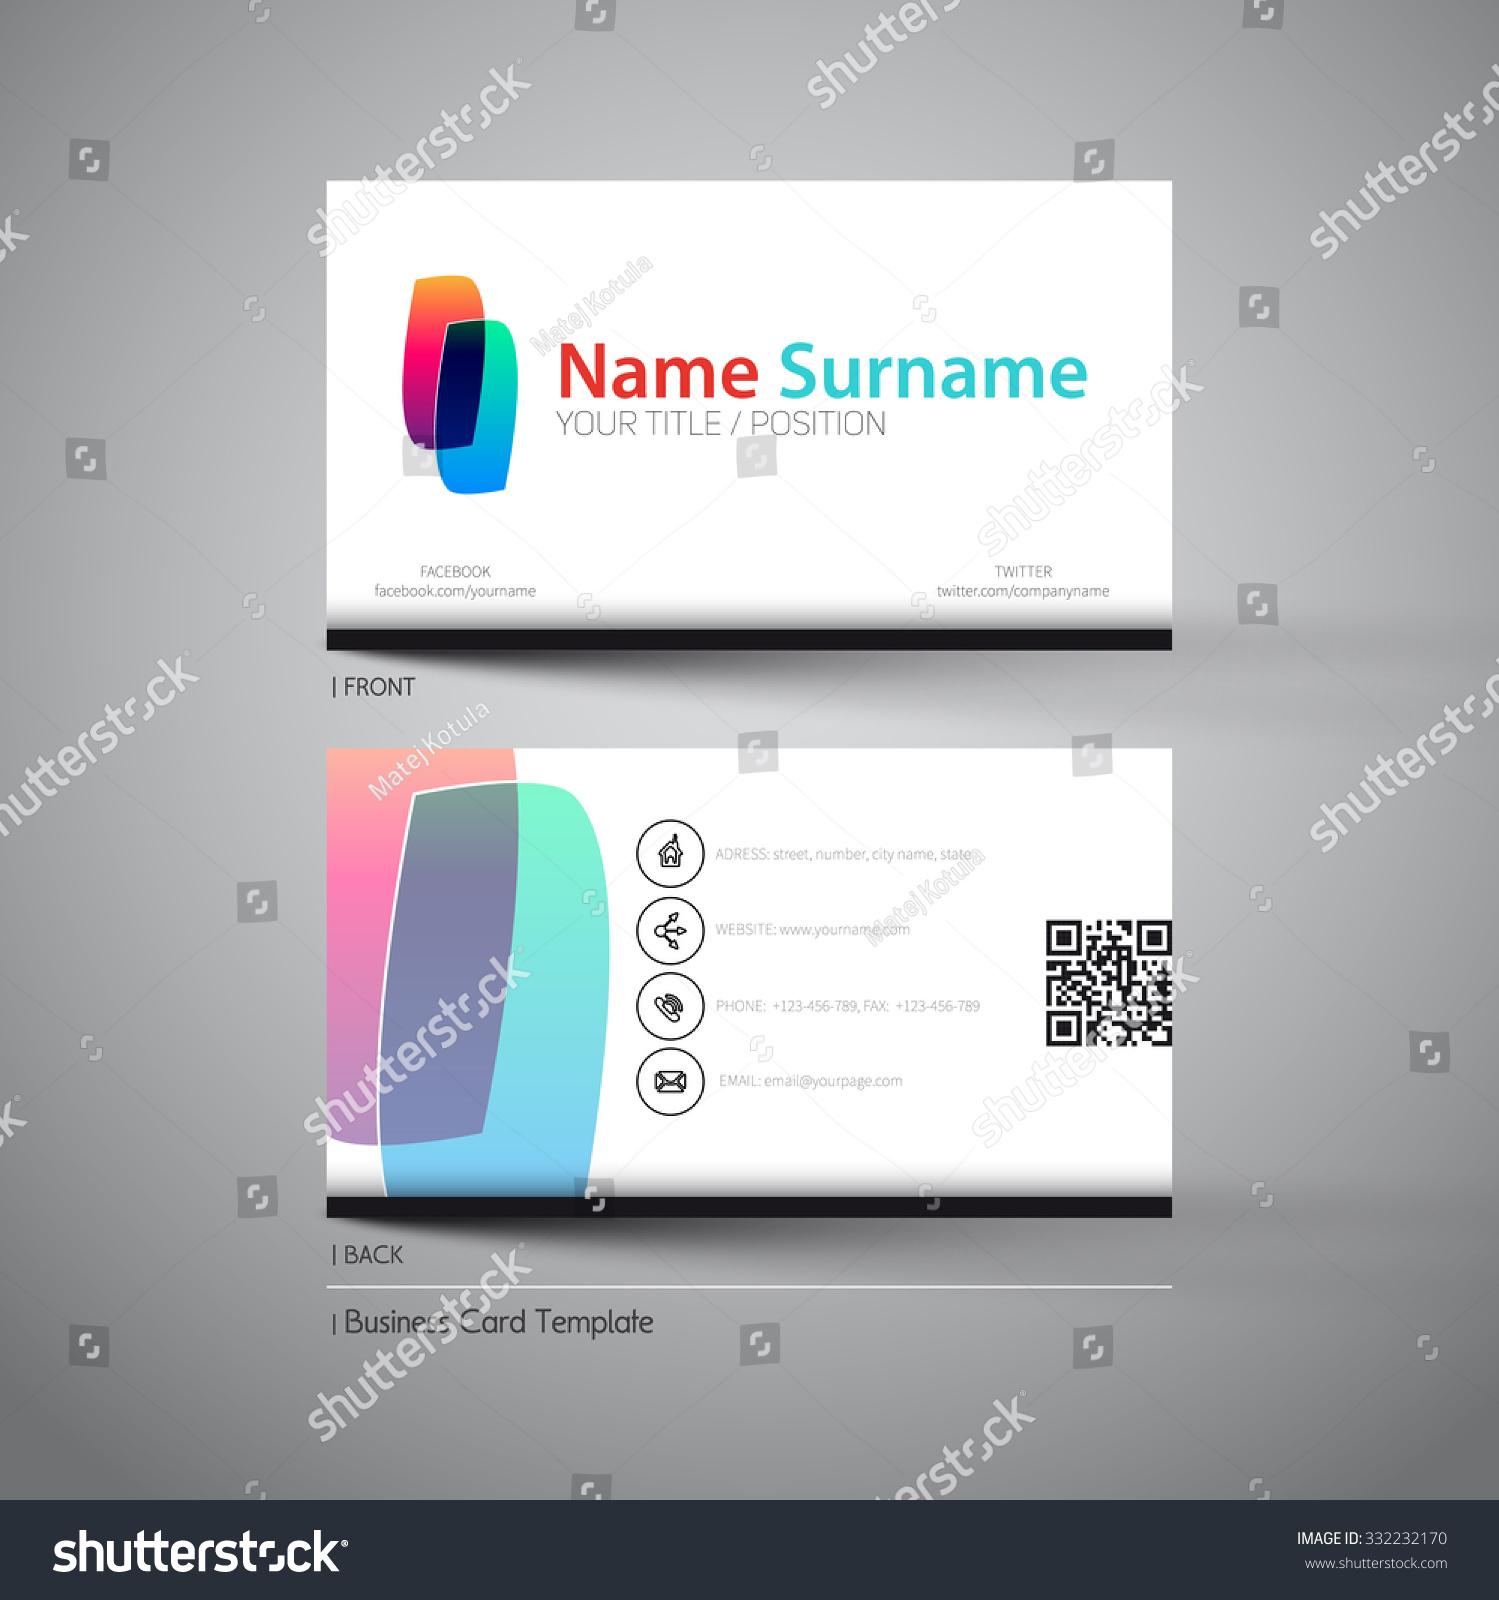 Facebook business card template mandegarfo facebook business card template colourmoves